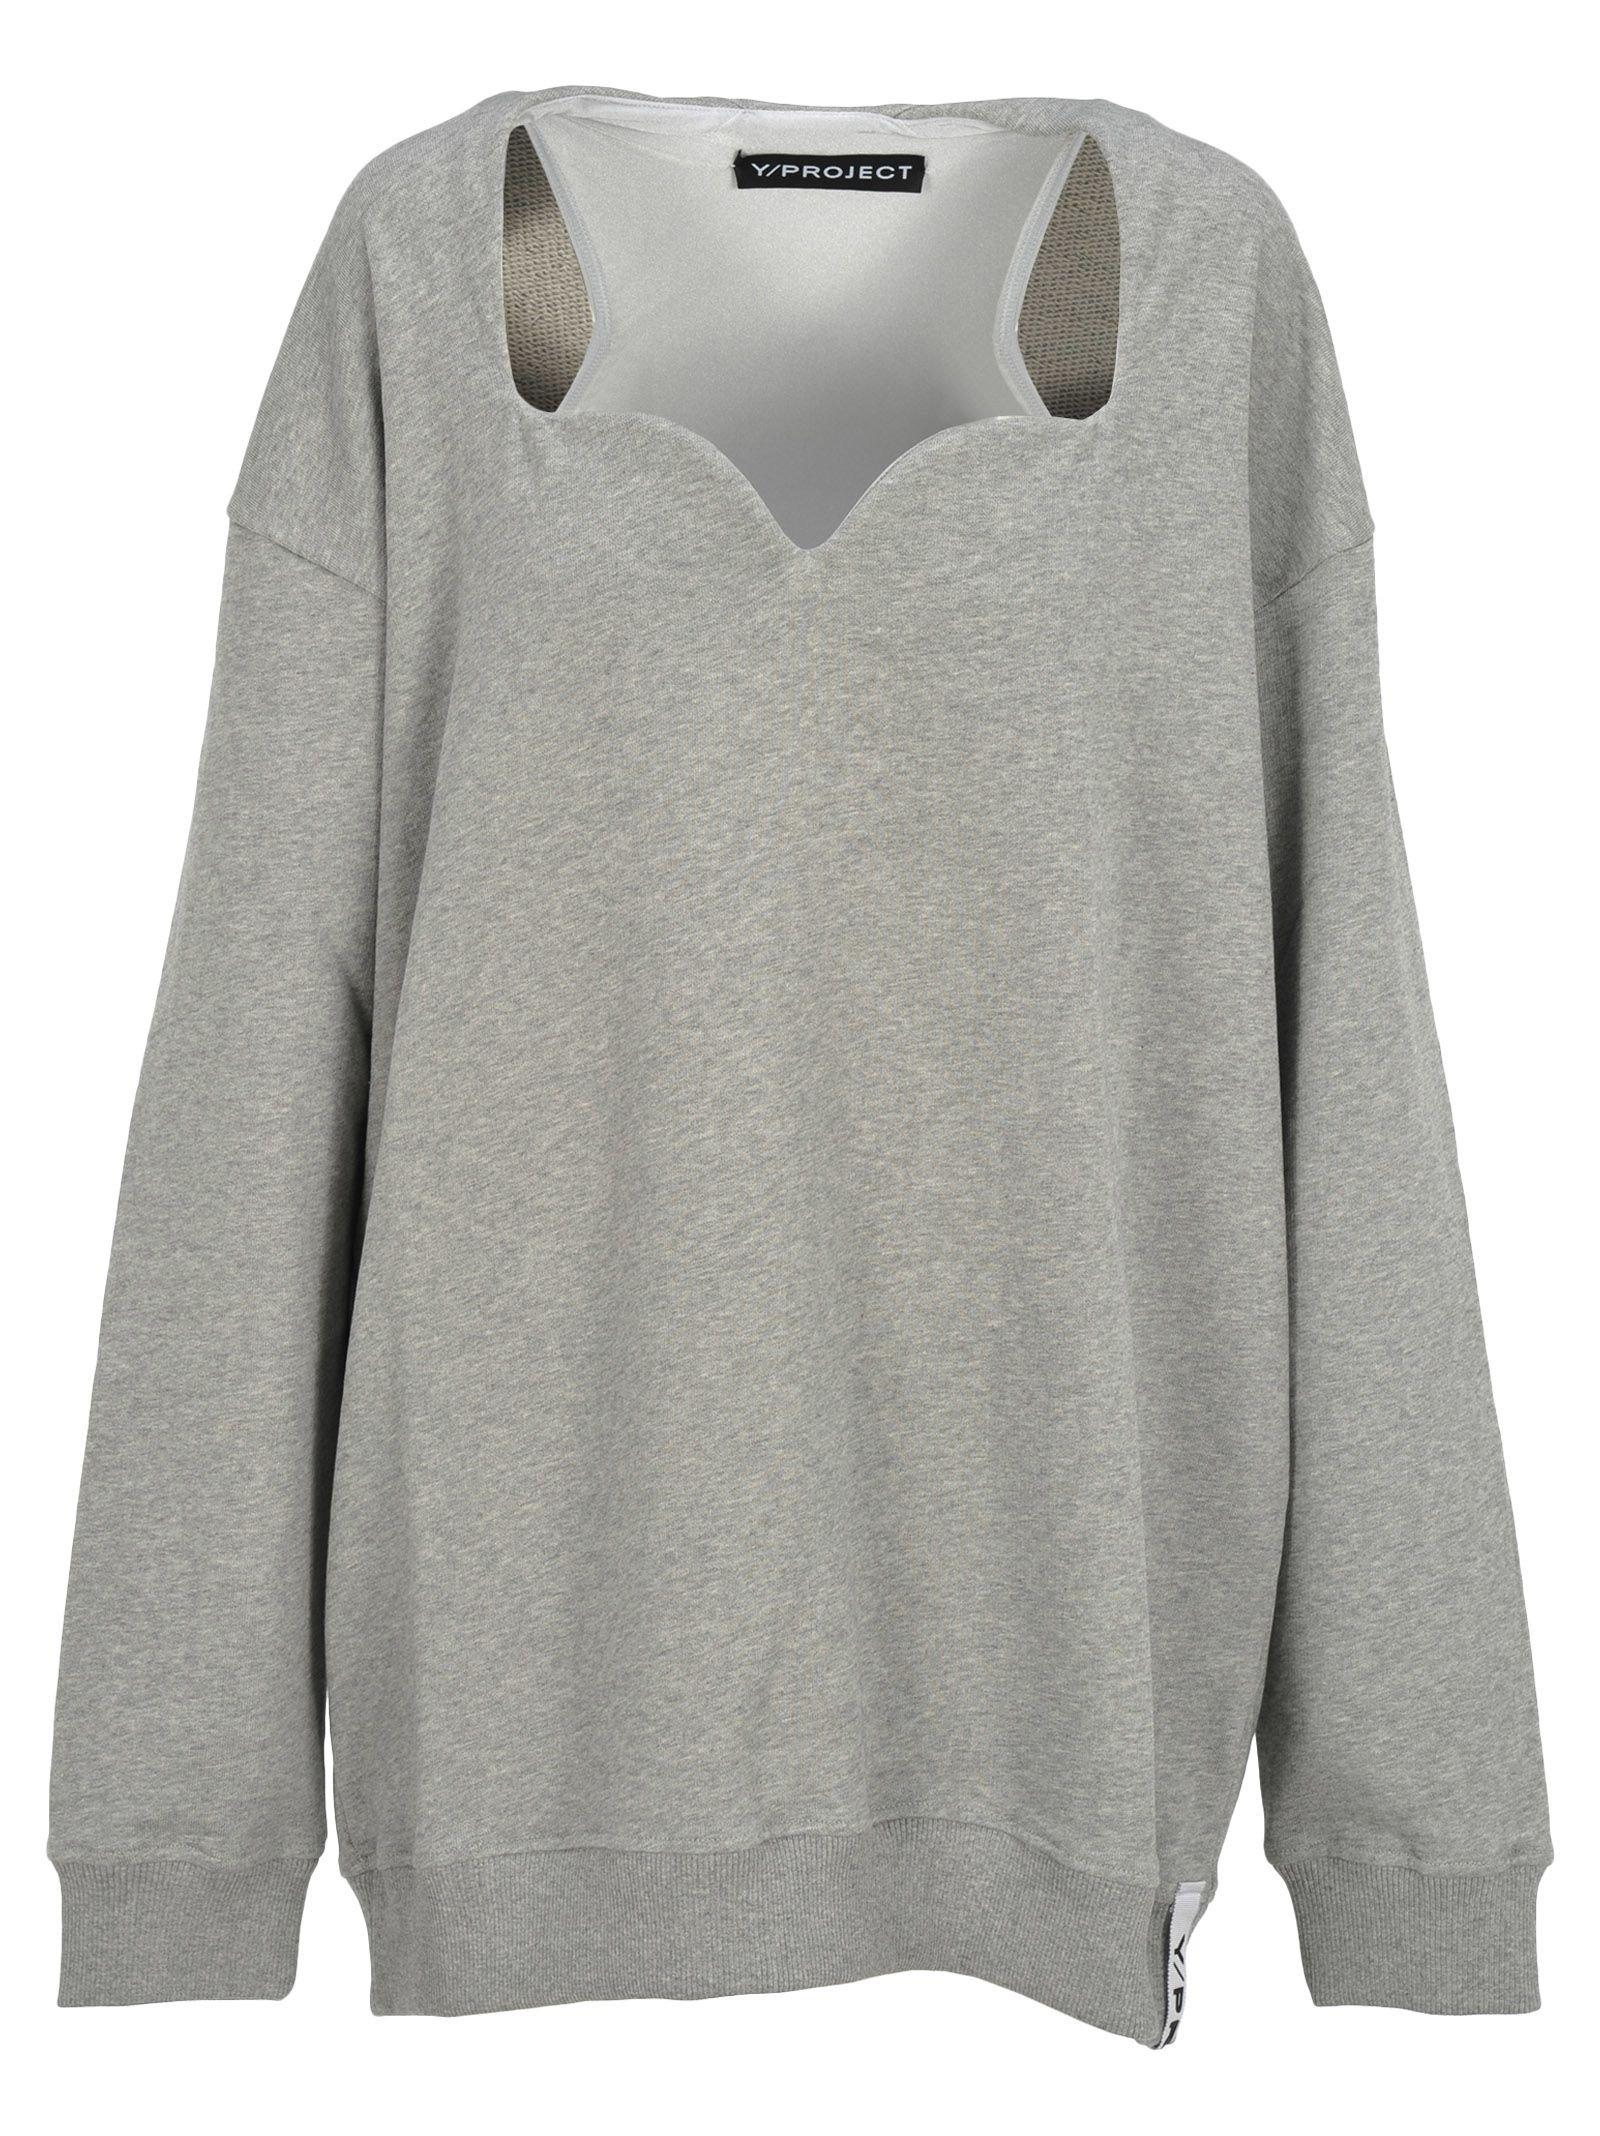 Y/project Y/project Oversized Sweatshirt